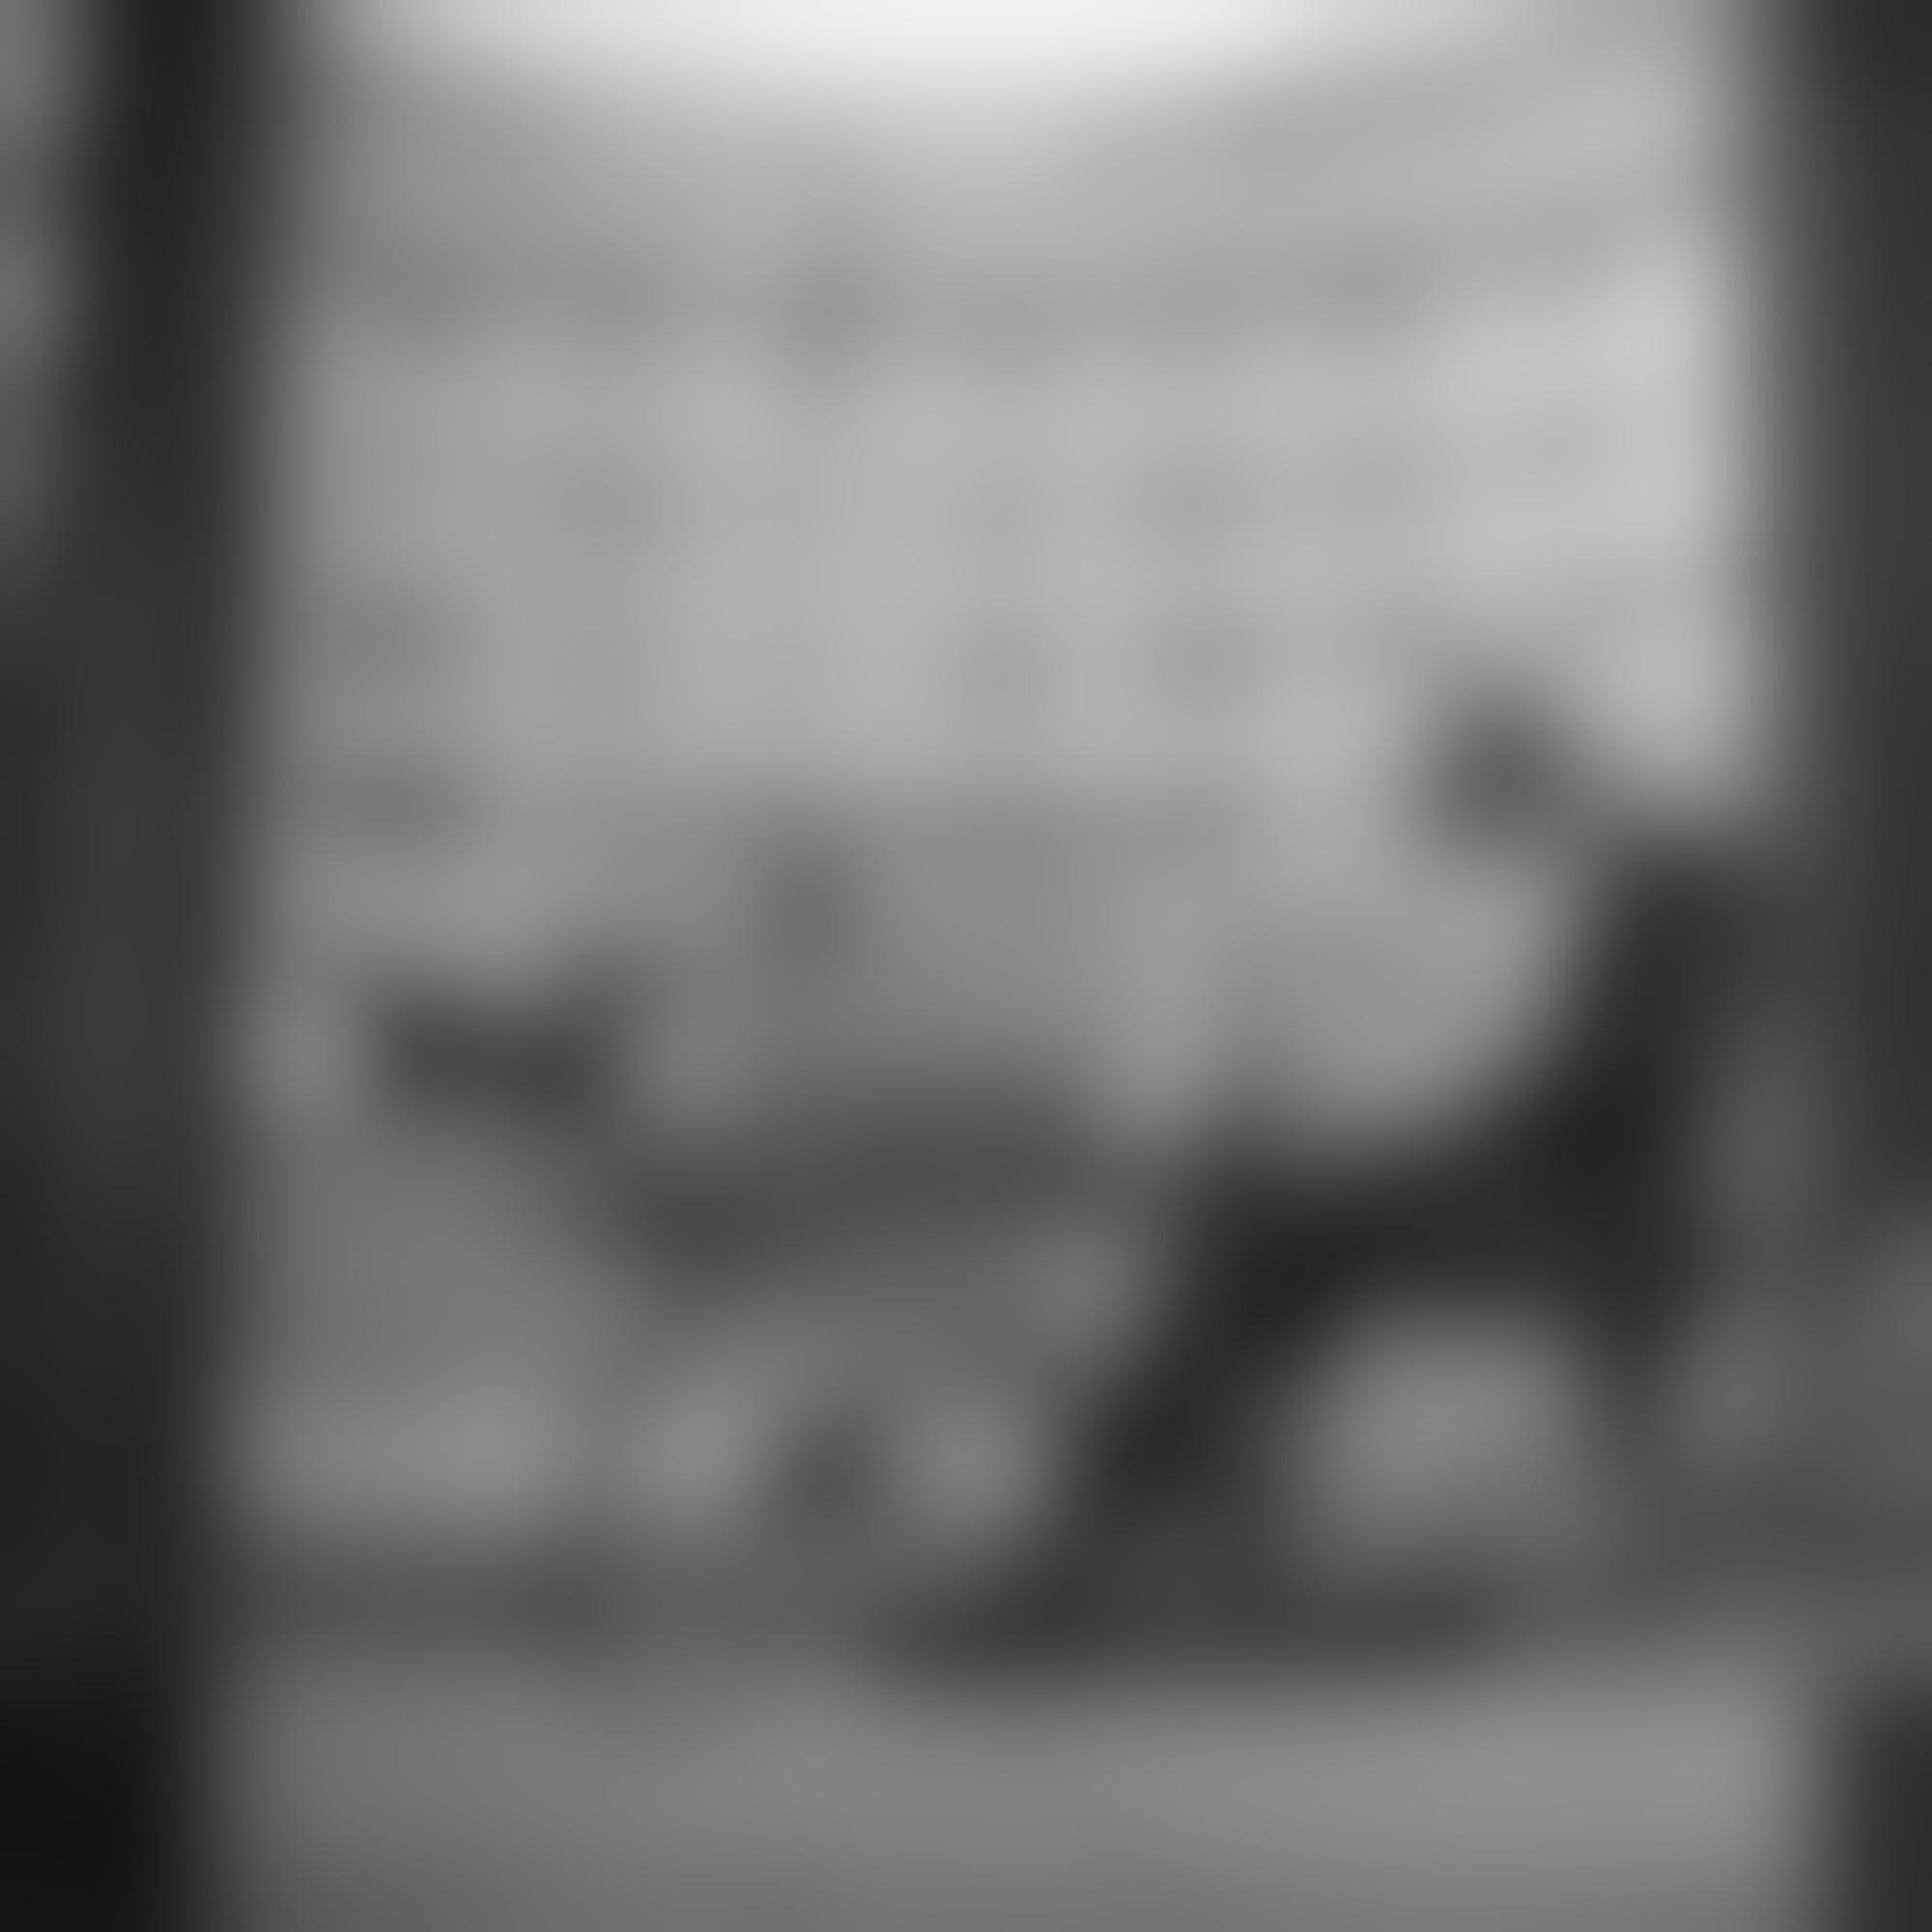 Tvc background 01 autocompressfitresizeixlibphp 1 1 0max h2000max w3 D2000q80s2cbd763ba43196914c1fb77432e9b068